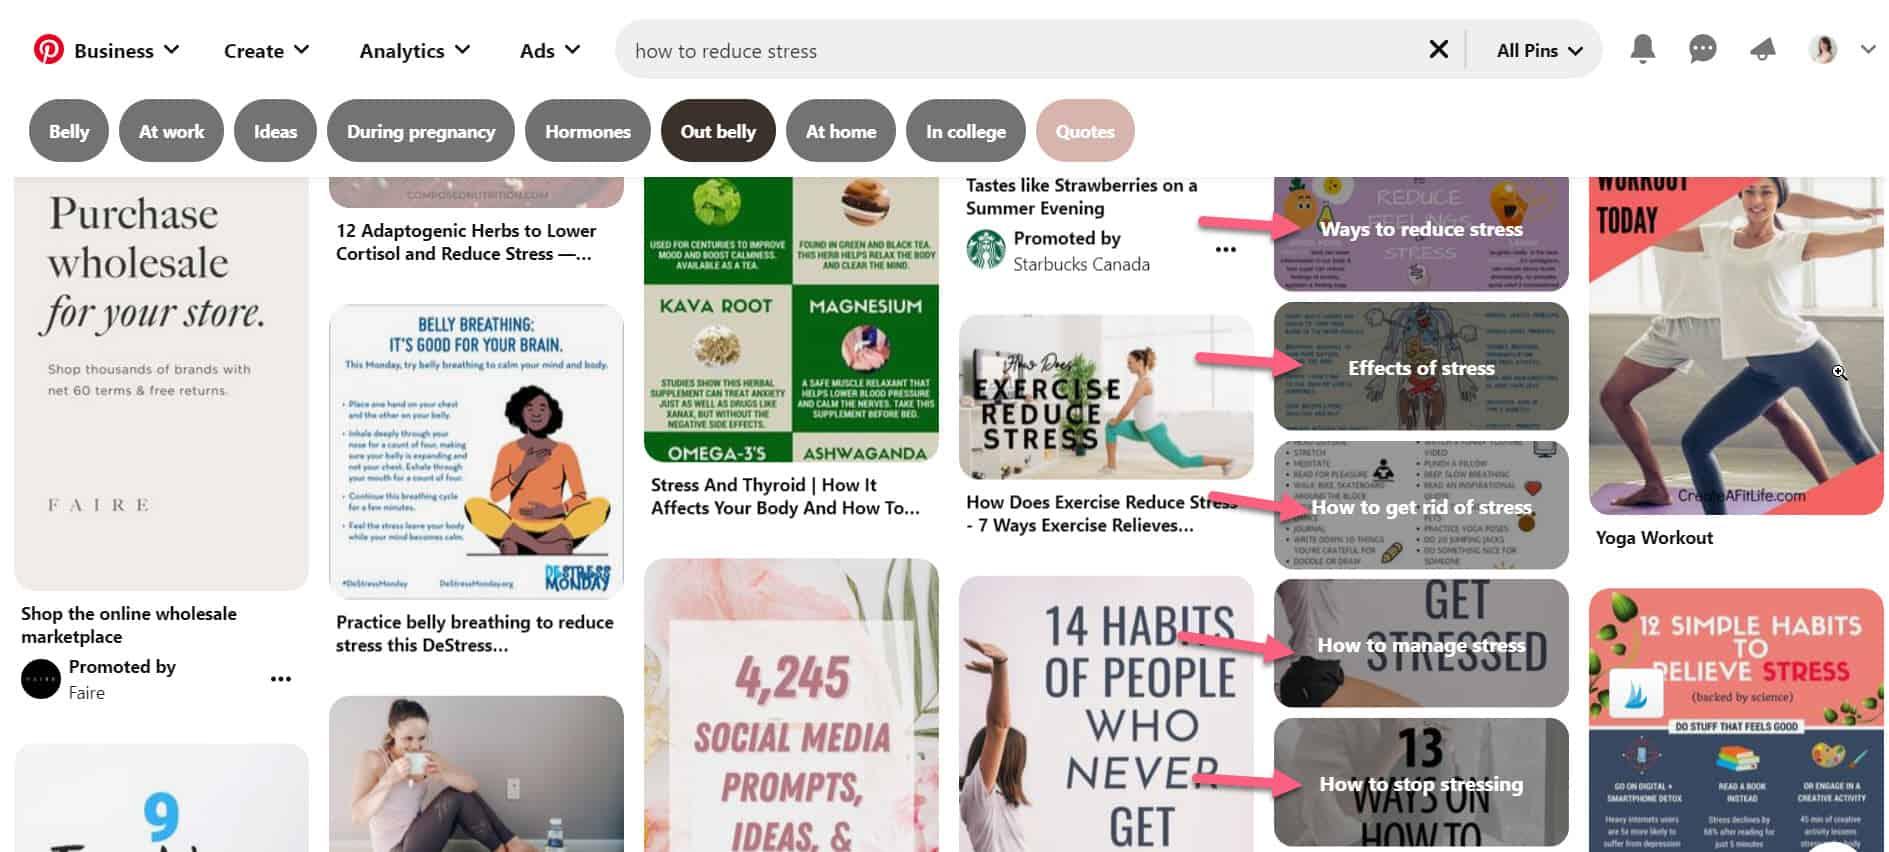 Finding related keywords on Pinterest